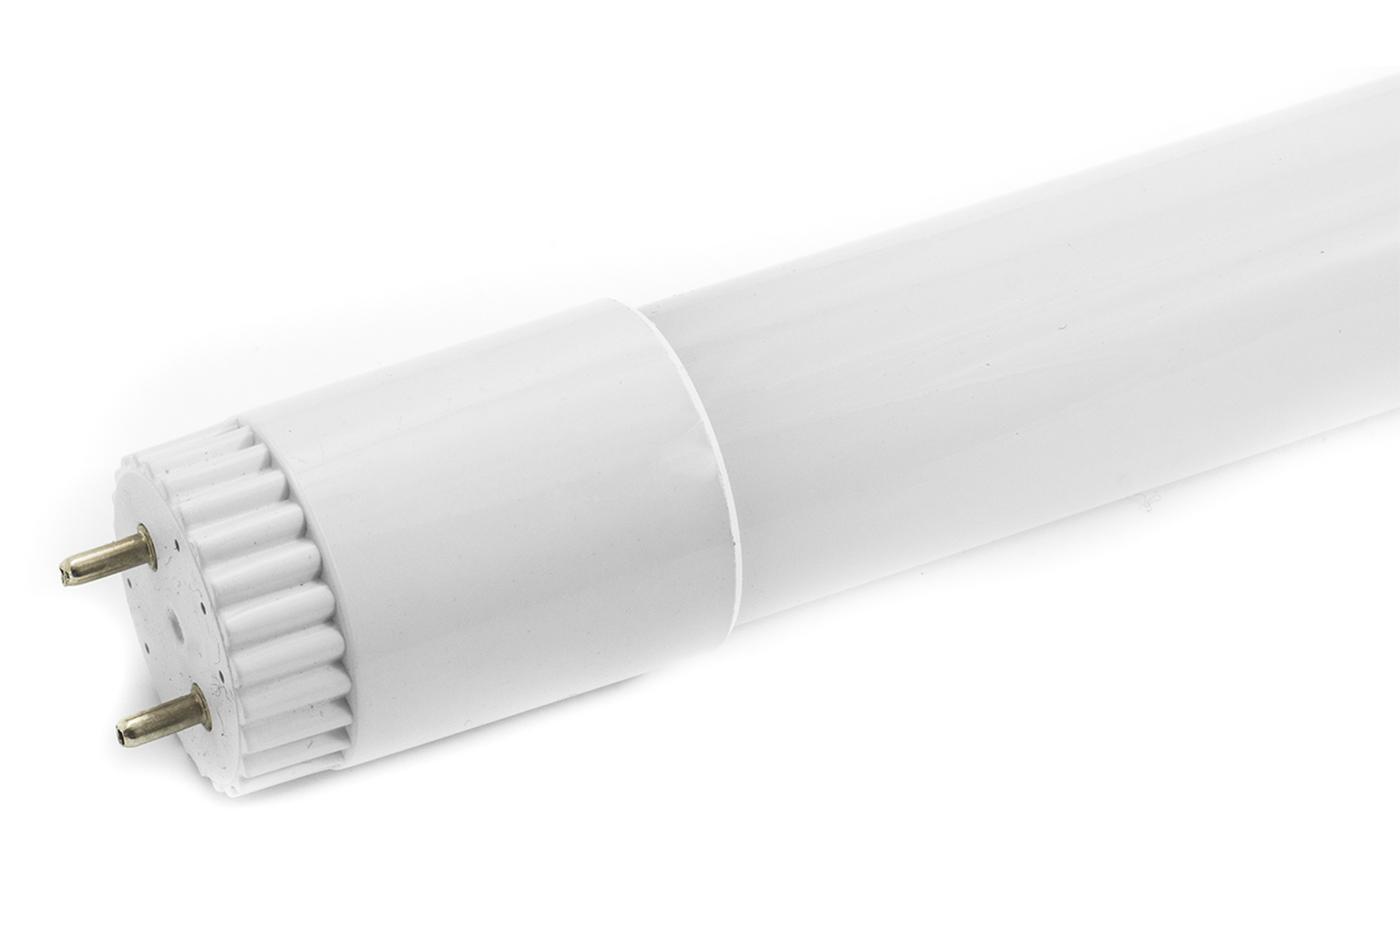 Plafoniera Tubo Led : Bes tubi led beselettronica neon tubo w cm